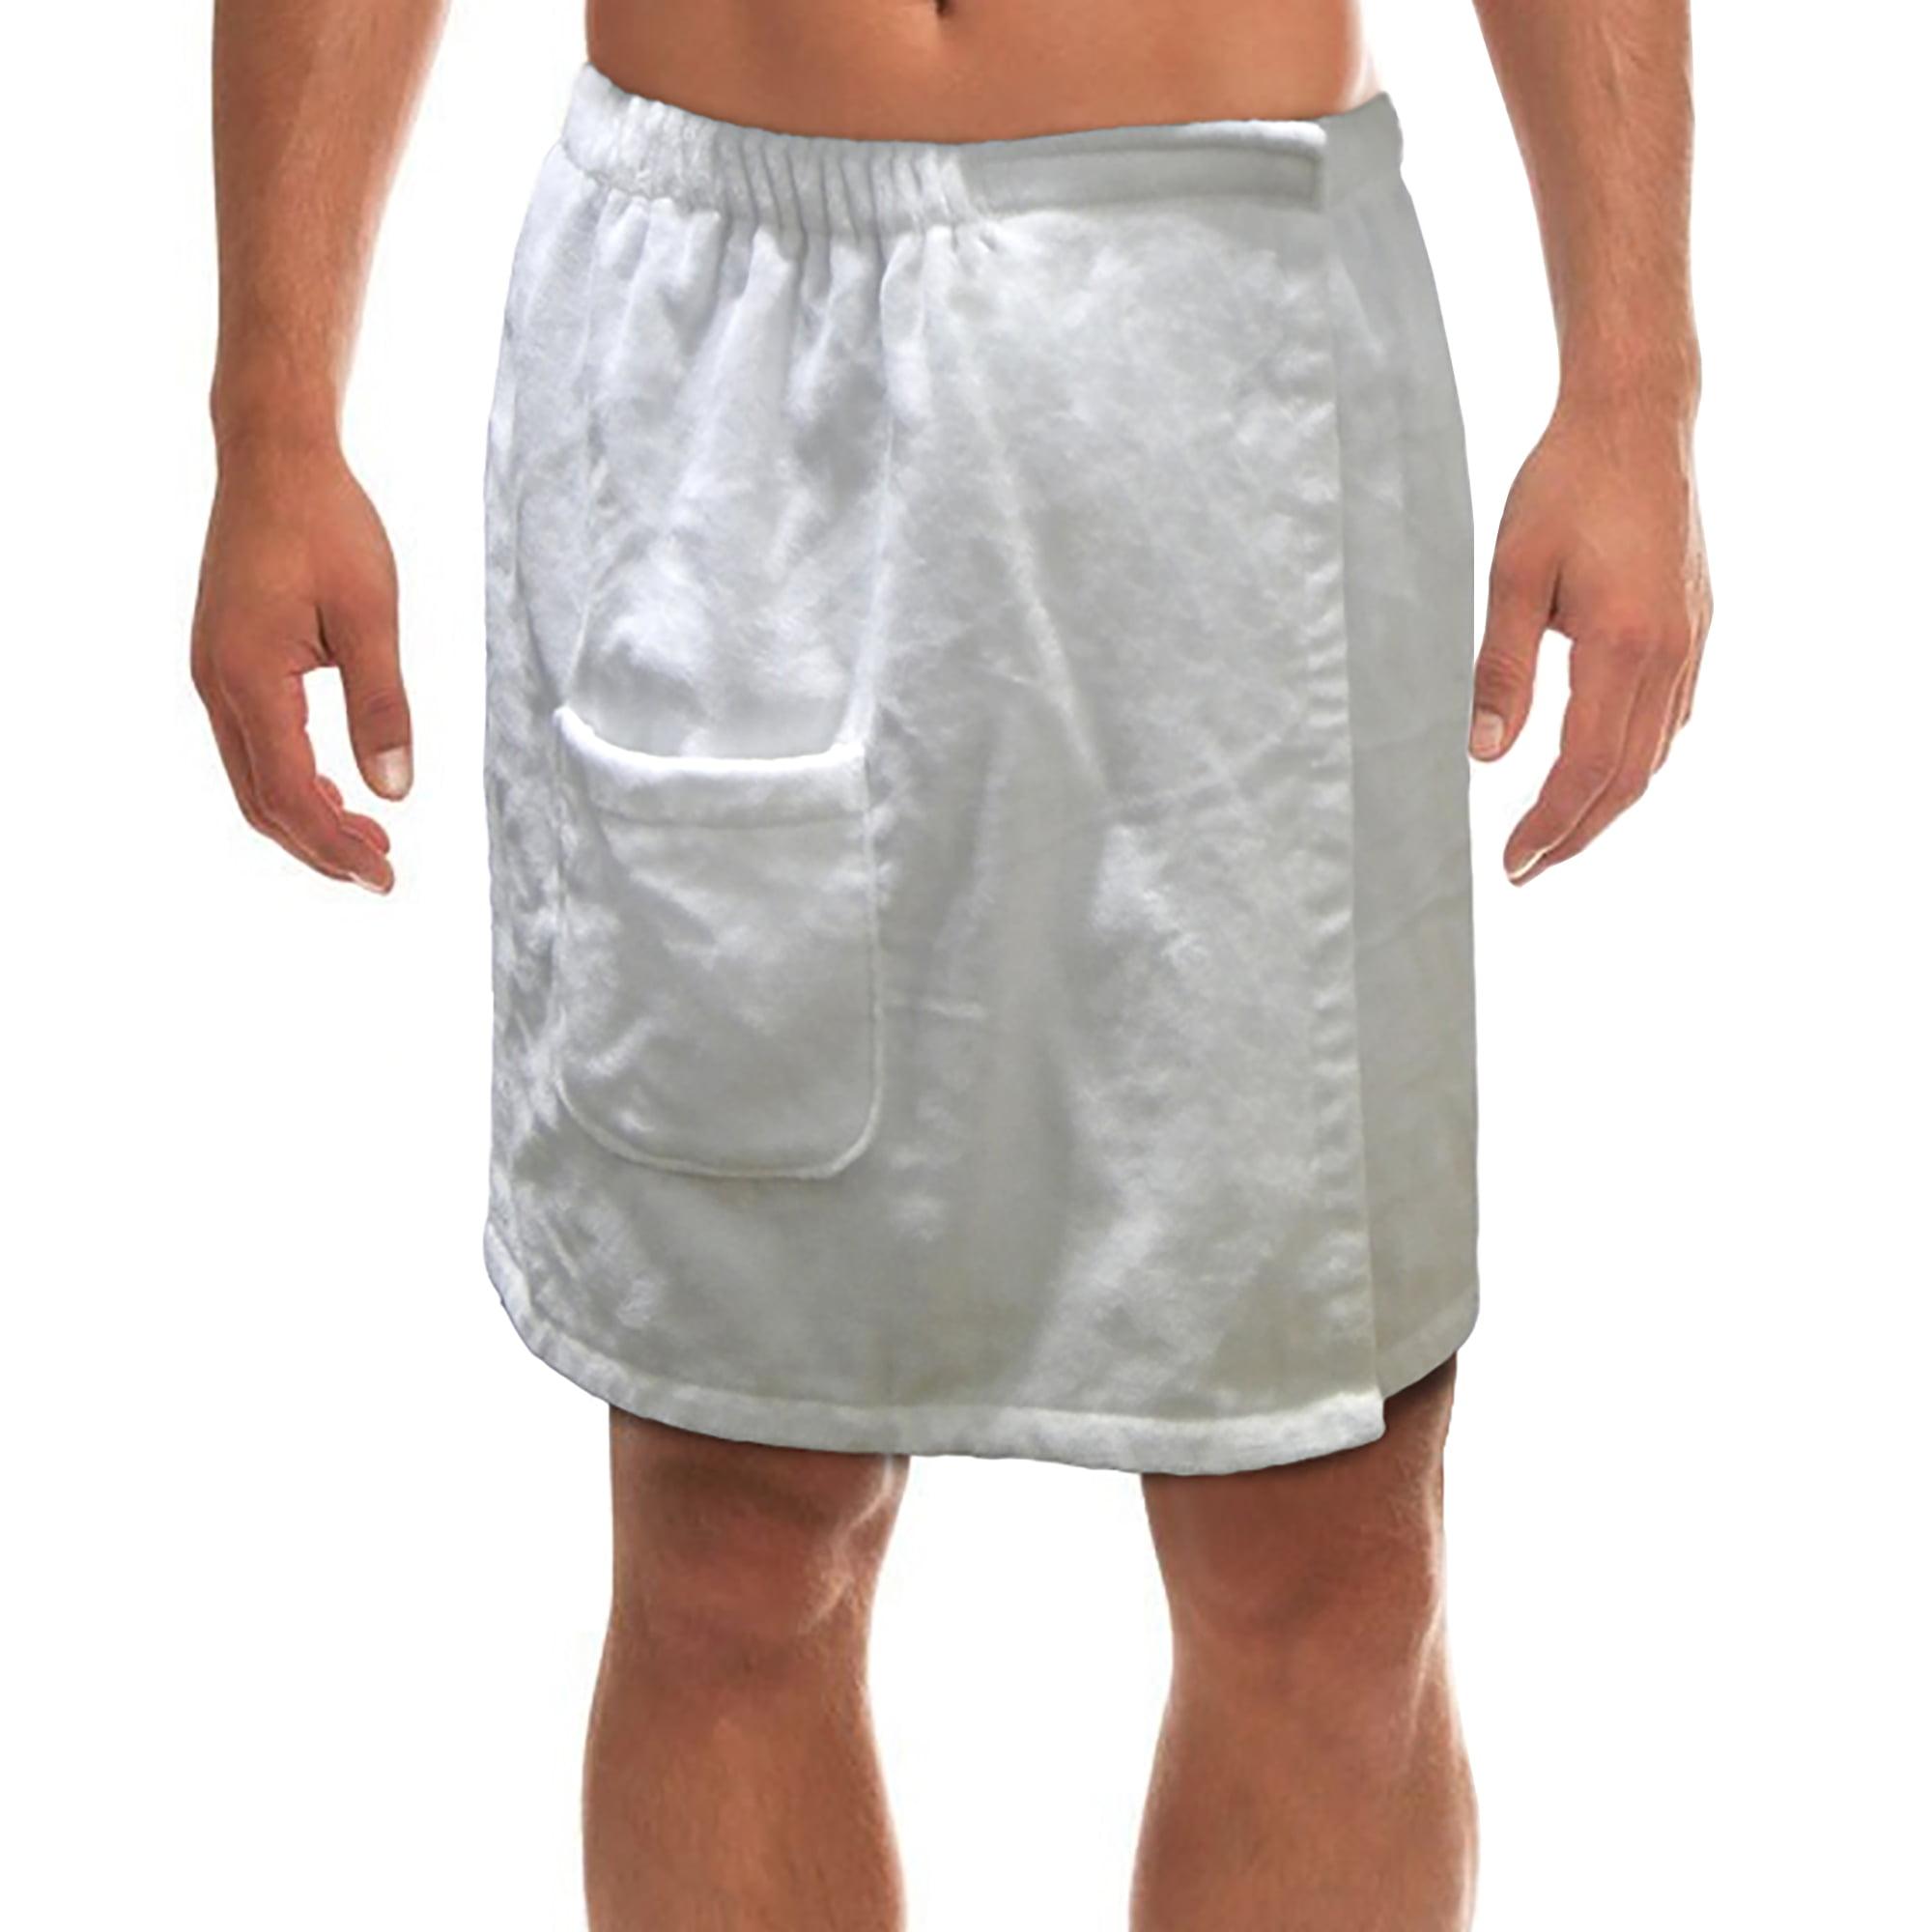 Radiant Saunas Men's Spa & Bath Terry Cloth Towel Wrap - White